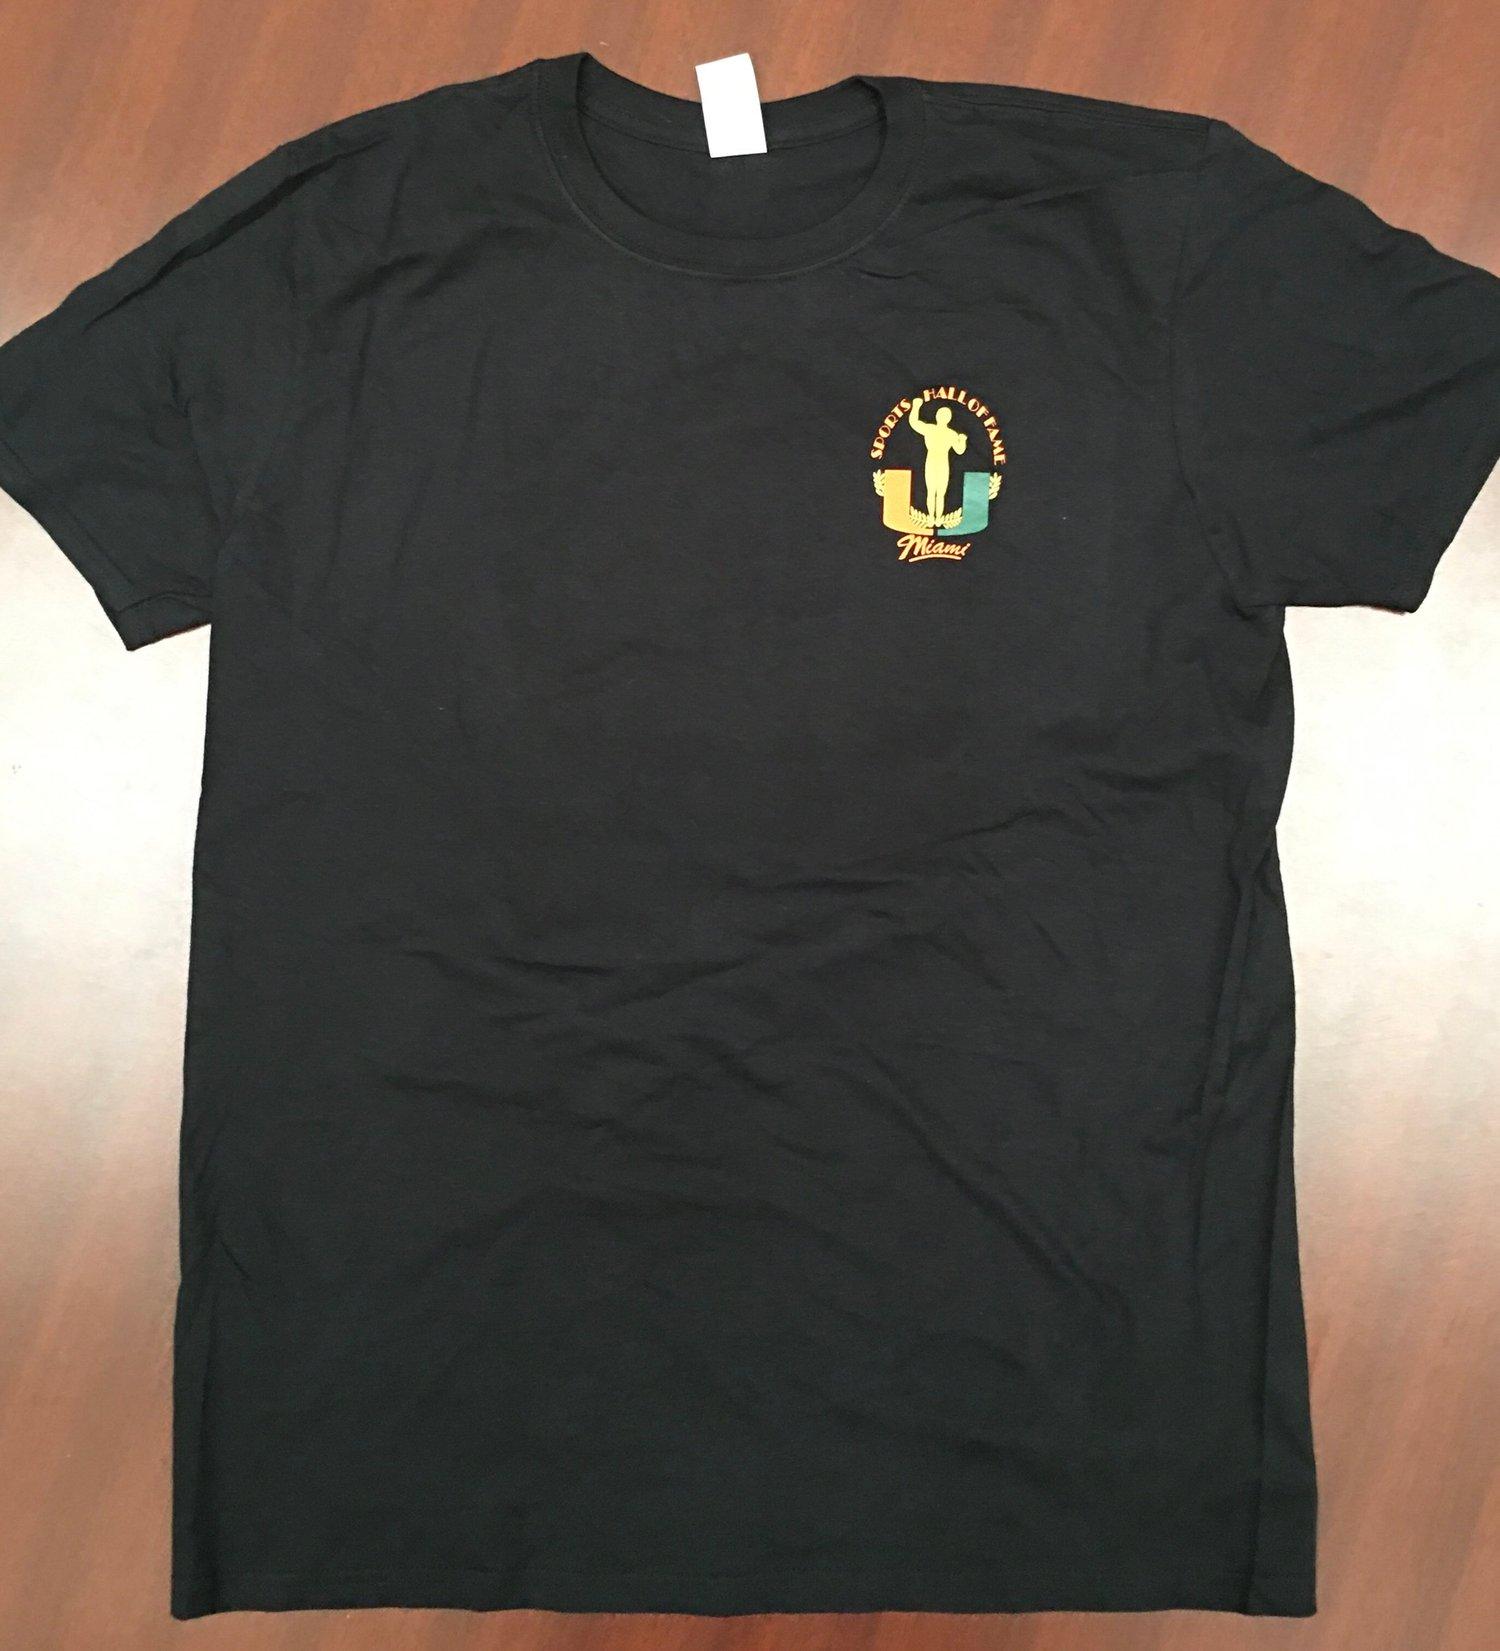 Image of Black UMSHoF Celebrity Bowling Tournament Tee Shirt